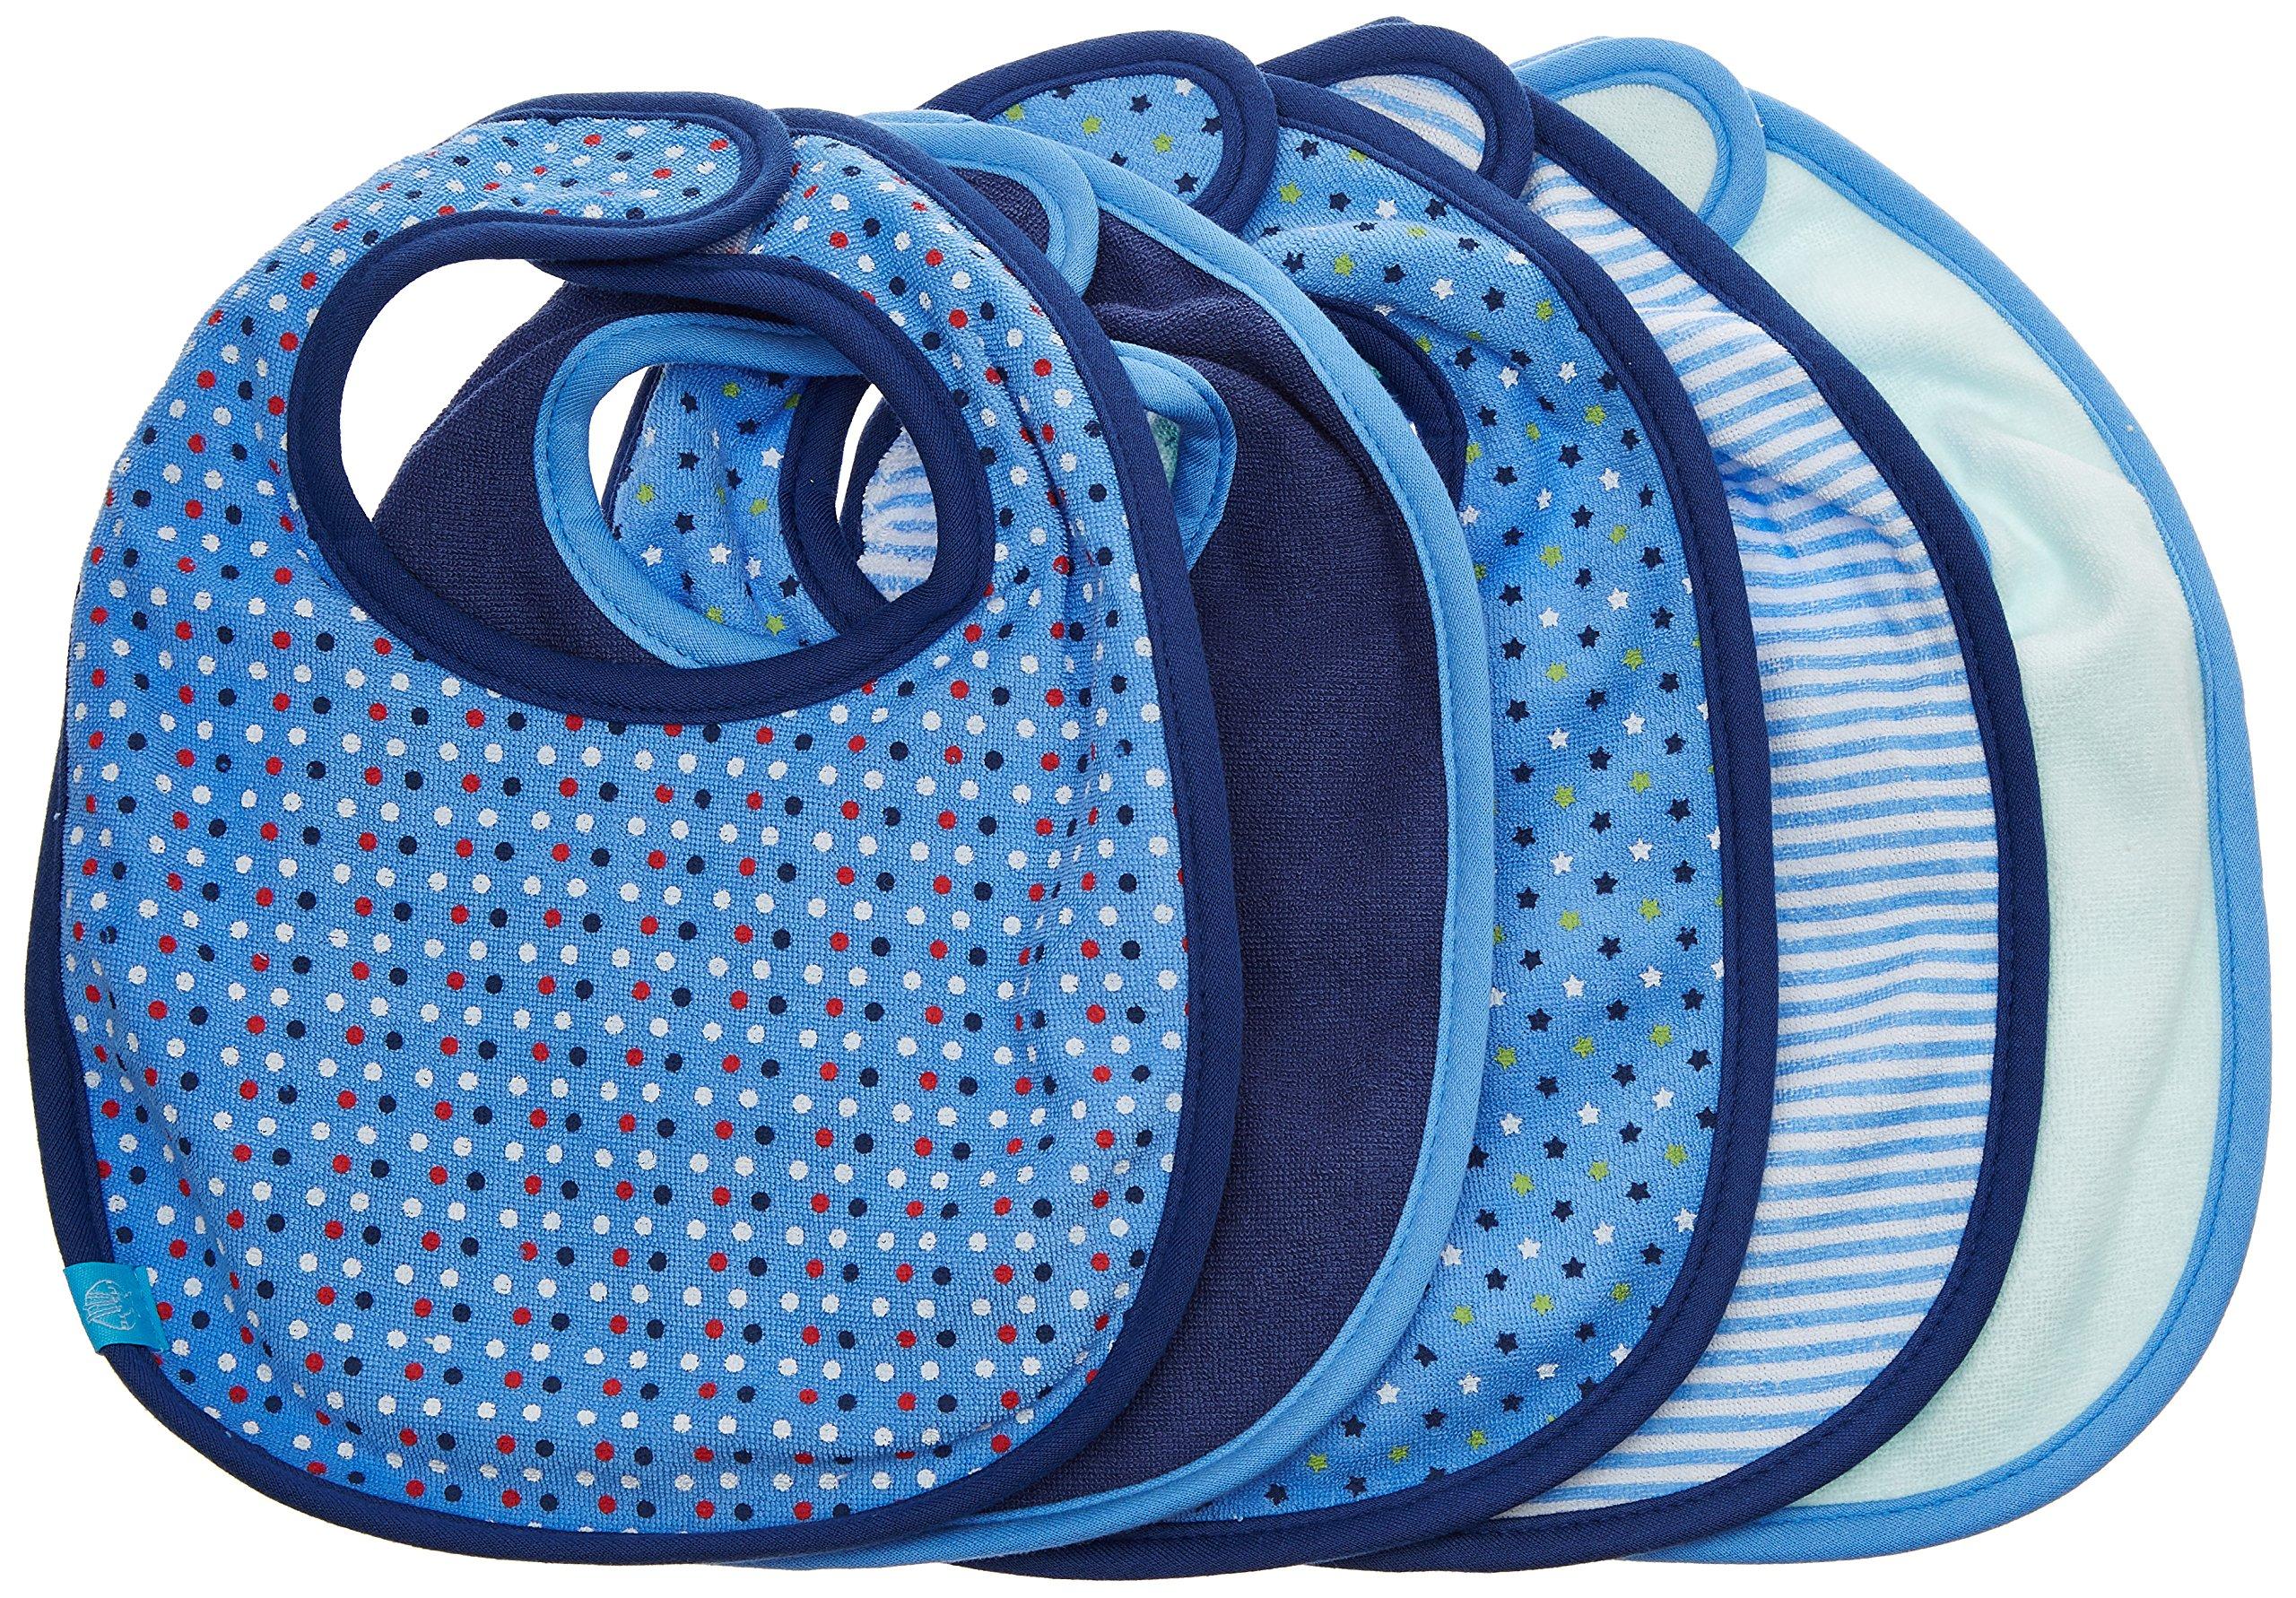 Lässig - Juego de 5 baberos azul marine Talla:talla única product image